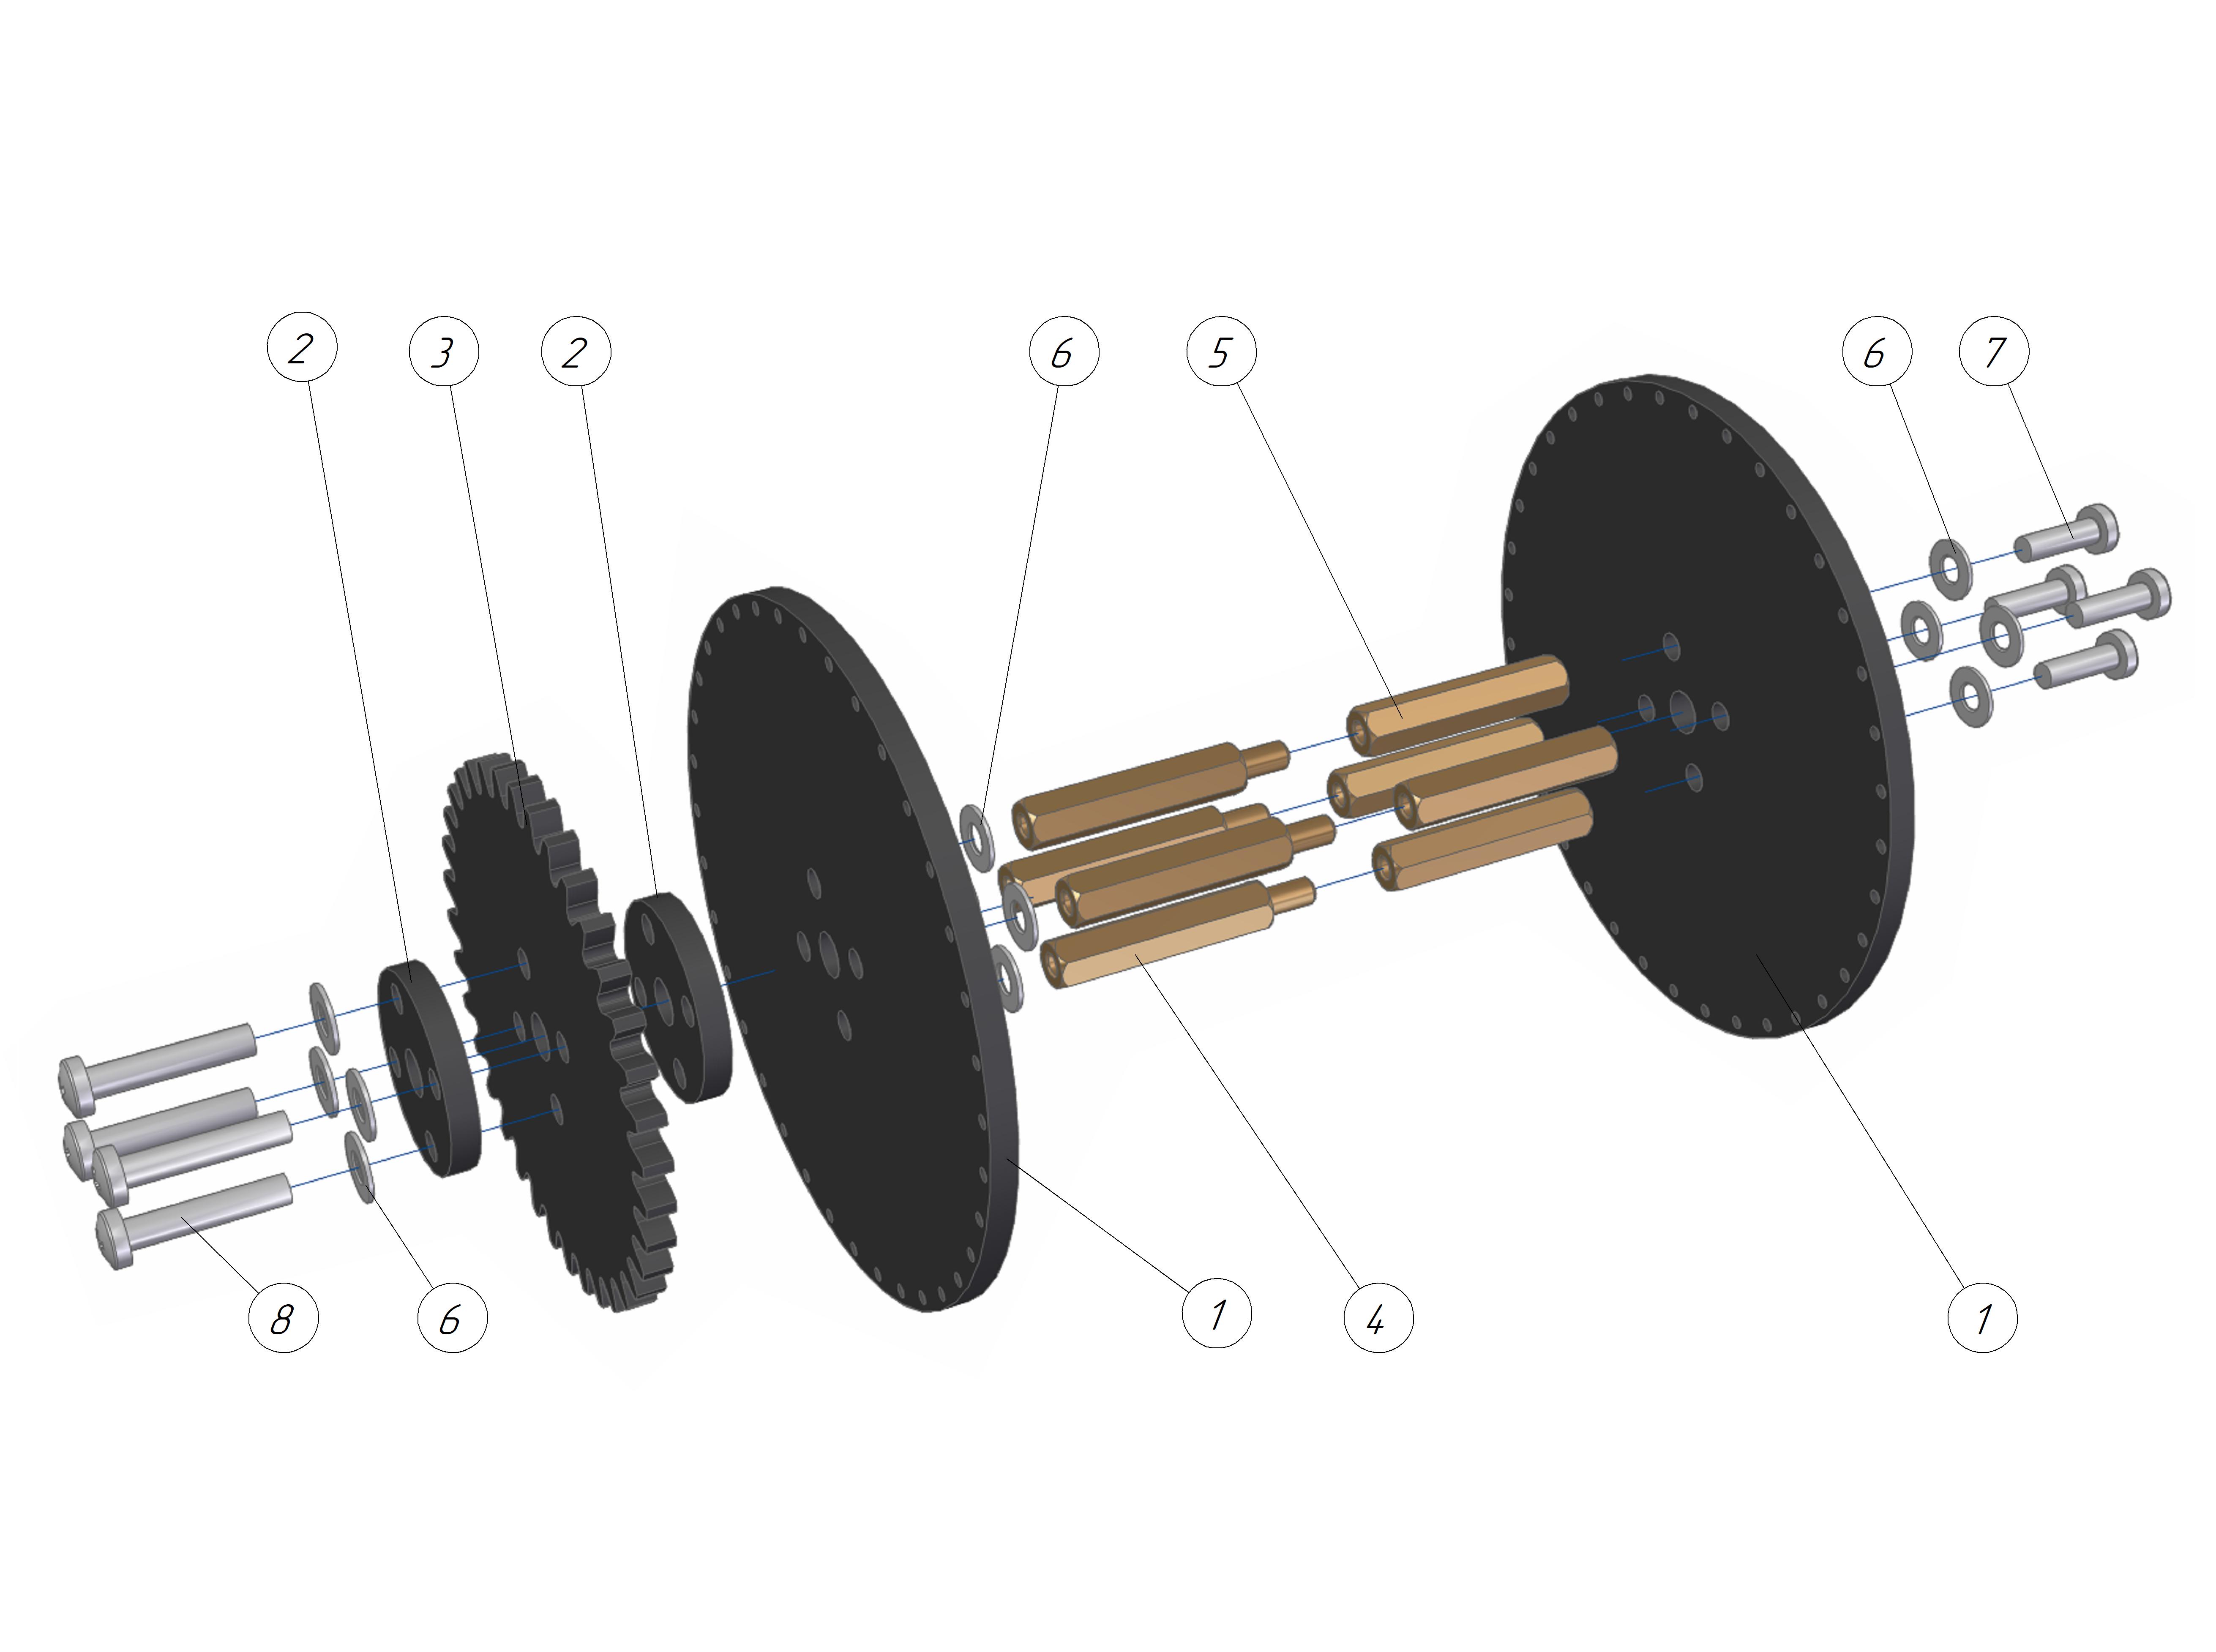 Picture of Mechanics. Assembling the Flip-holder.